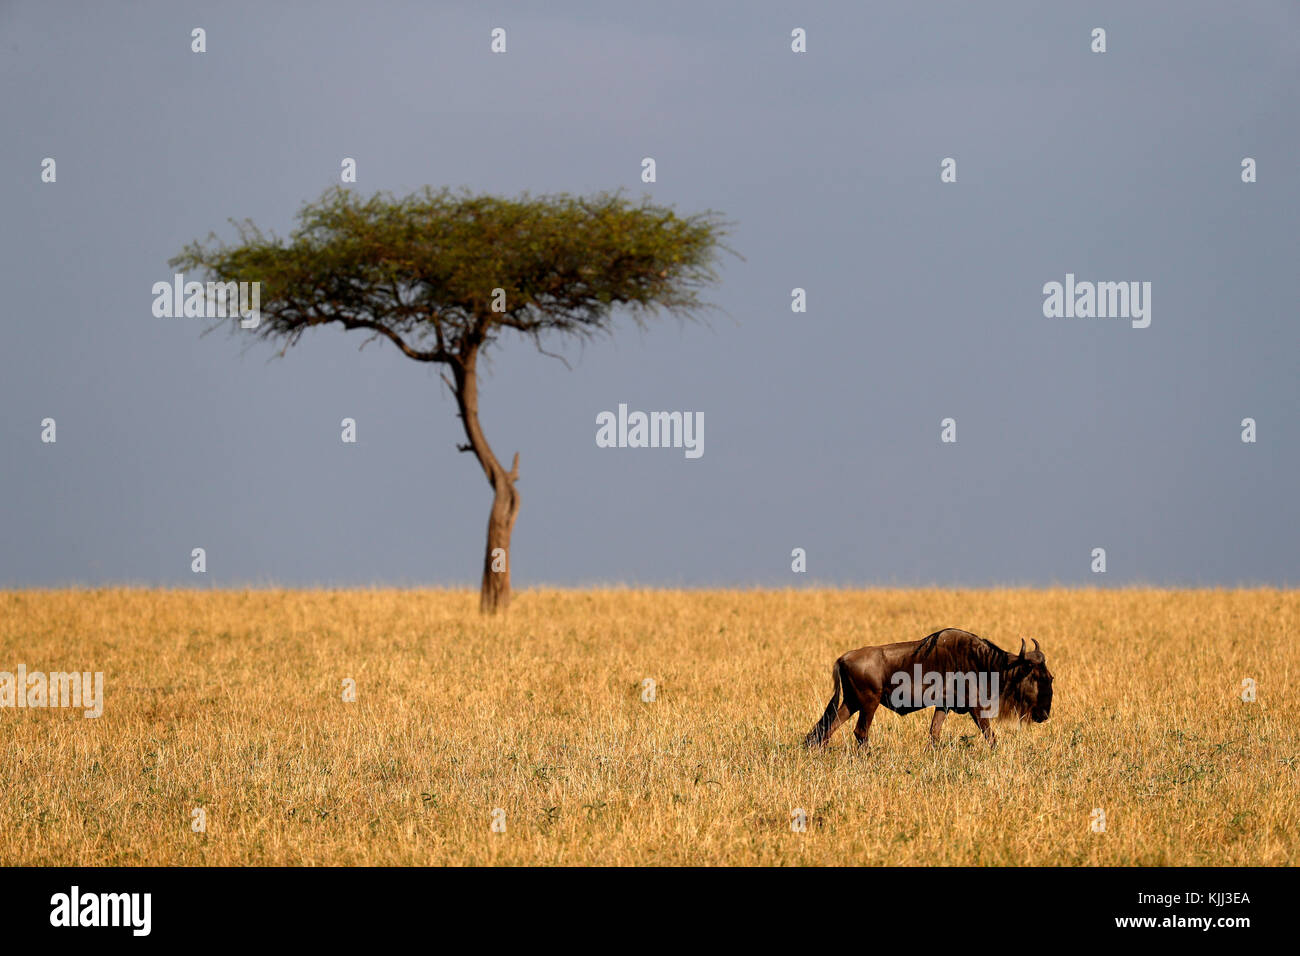 African savanna, acacia and  wildebeest. Masai Mara game reserve. Kenya. - Stock Image